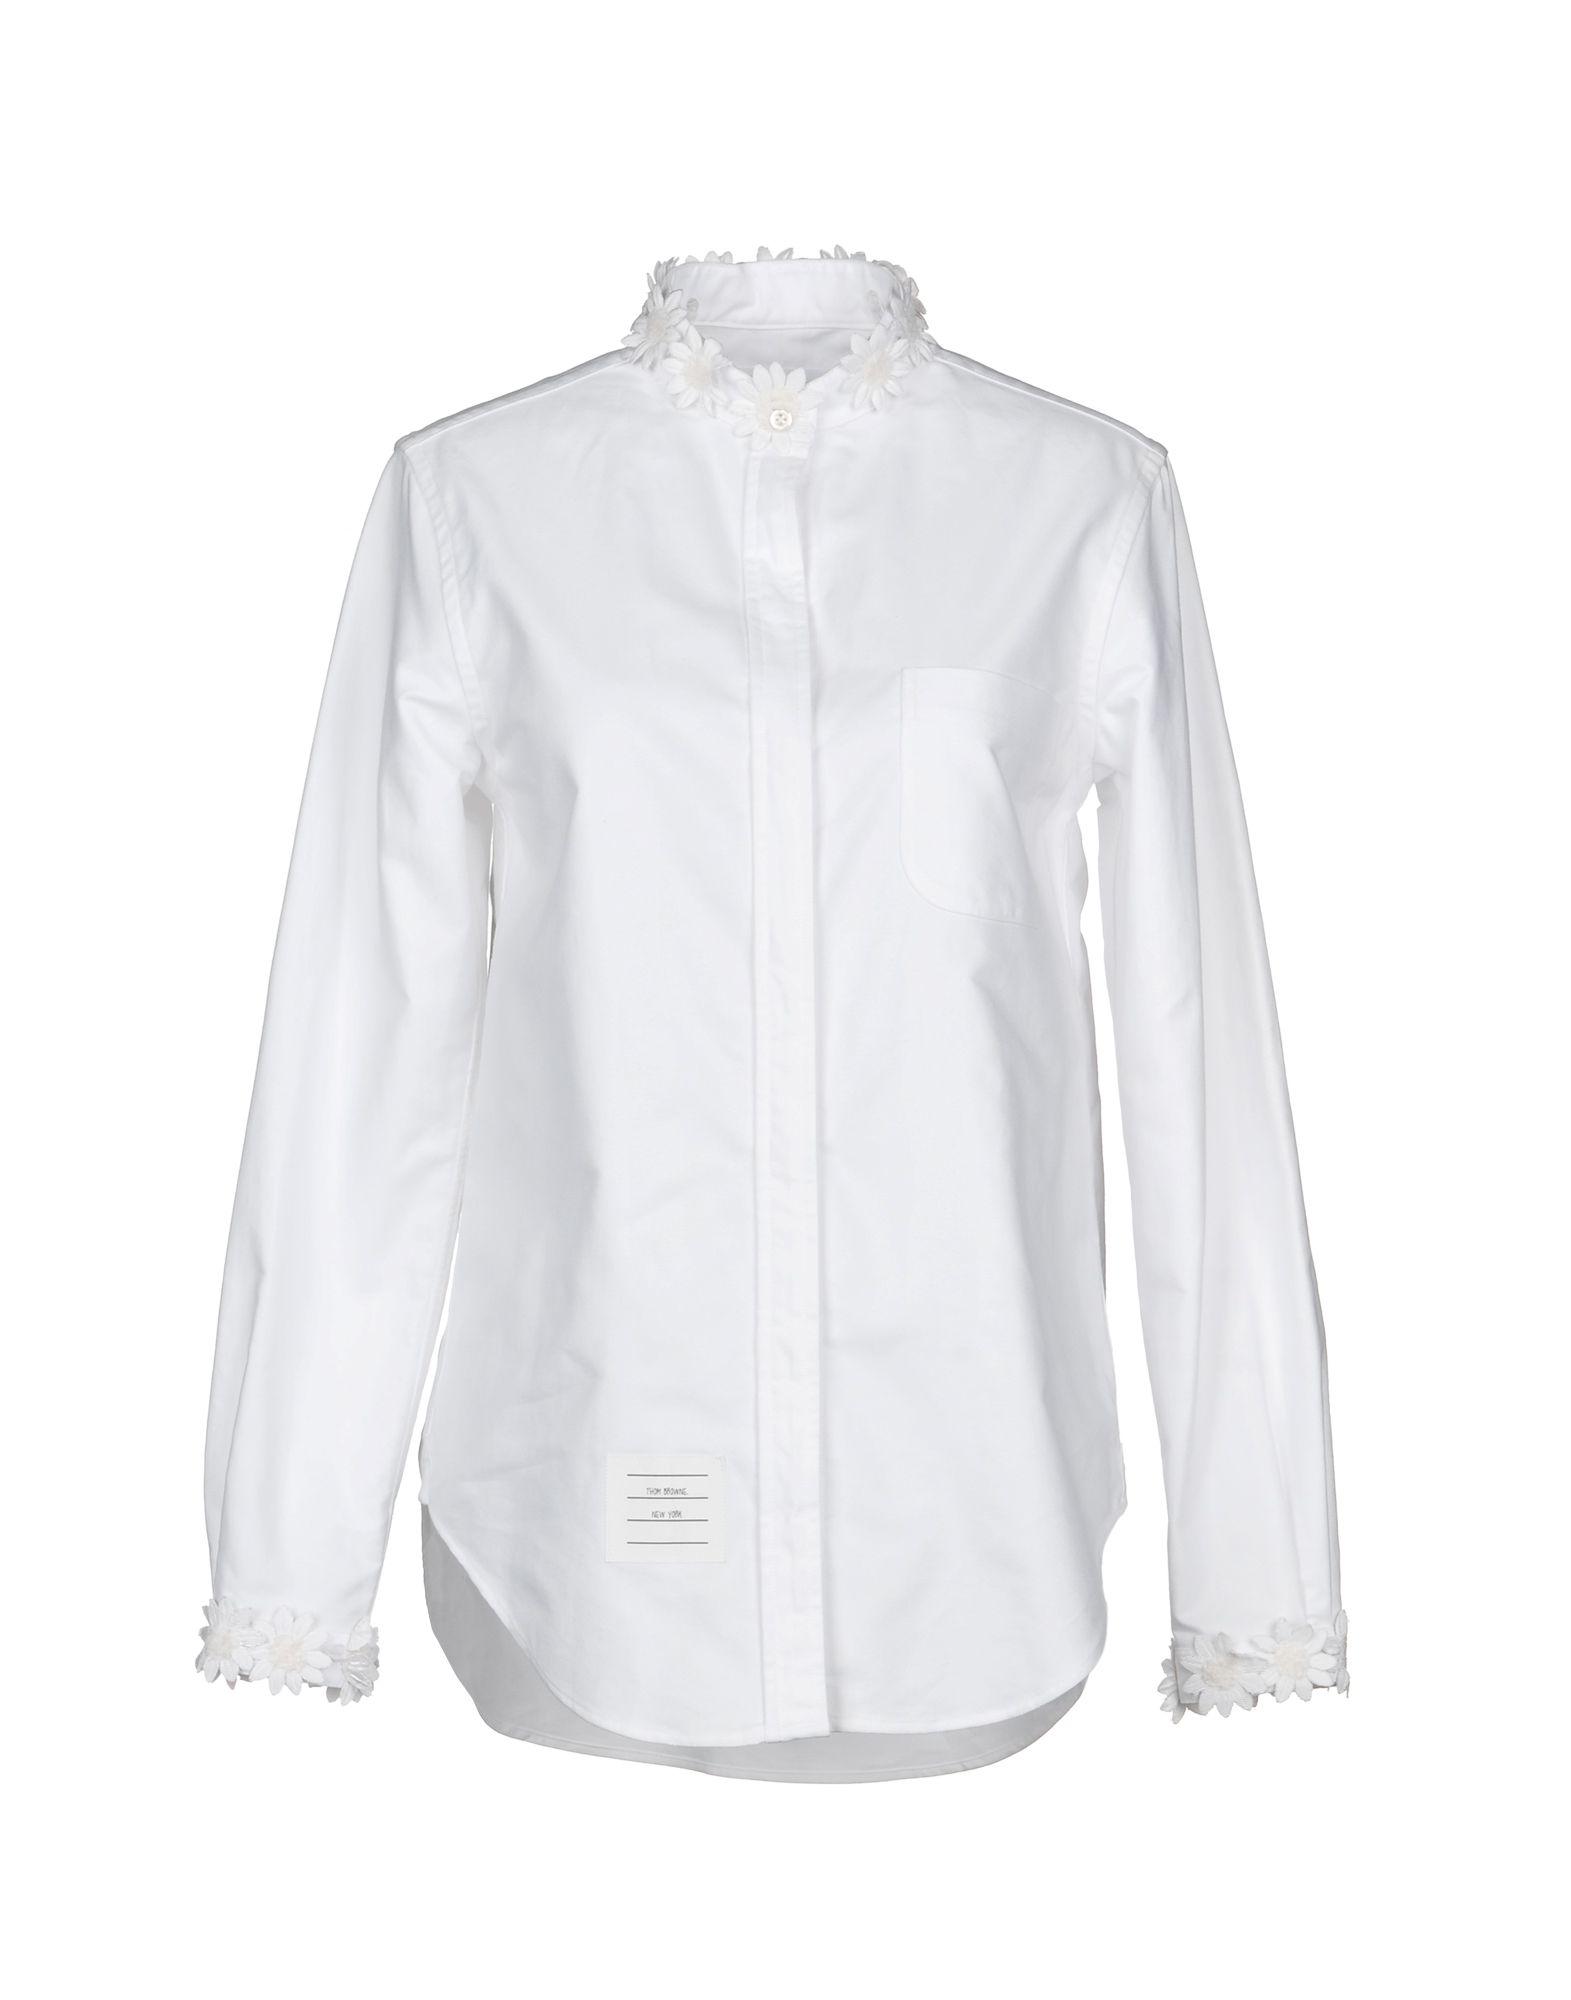 THOM BROWNE Pубашка thom browne шорты для плавания